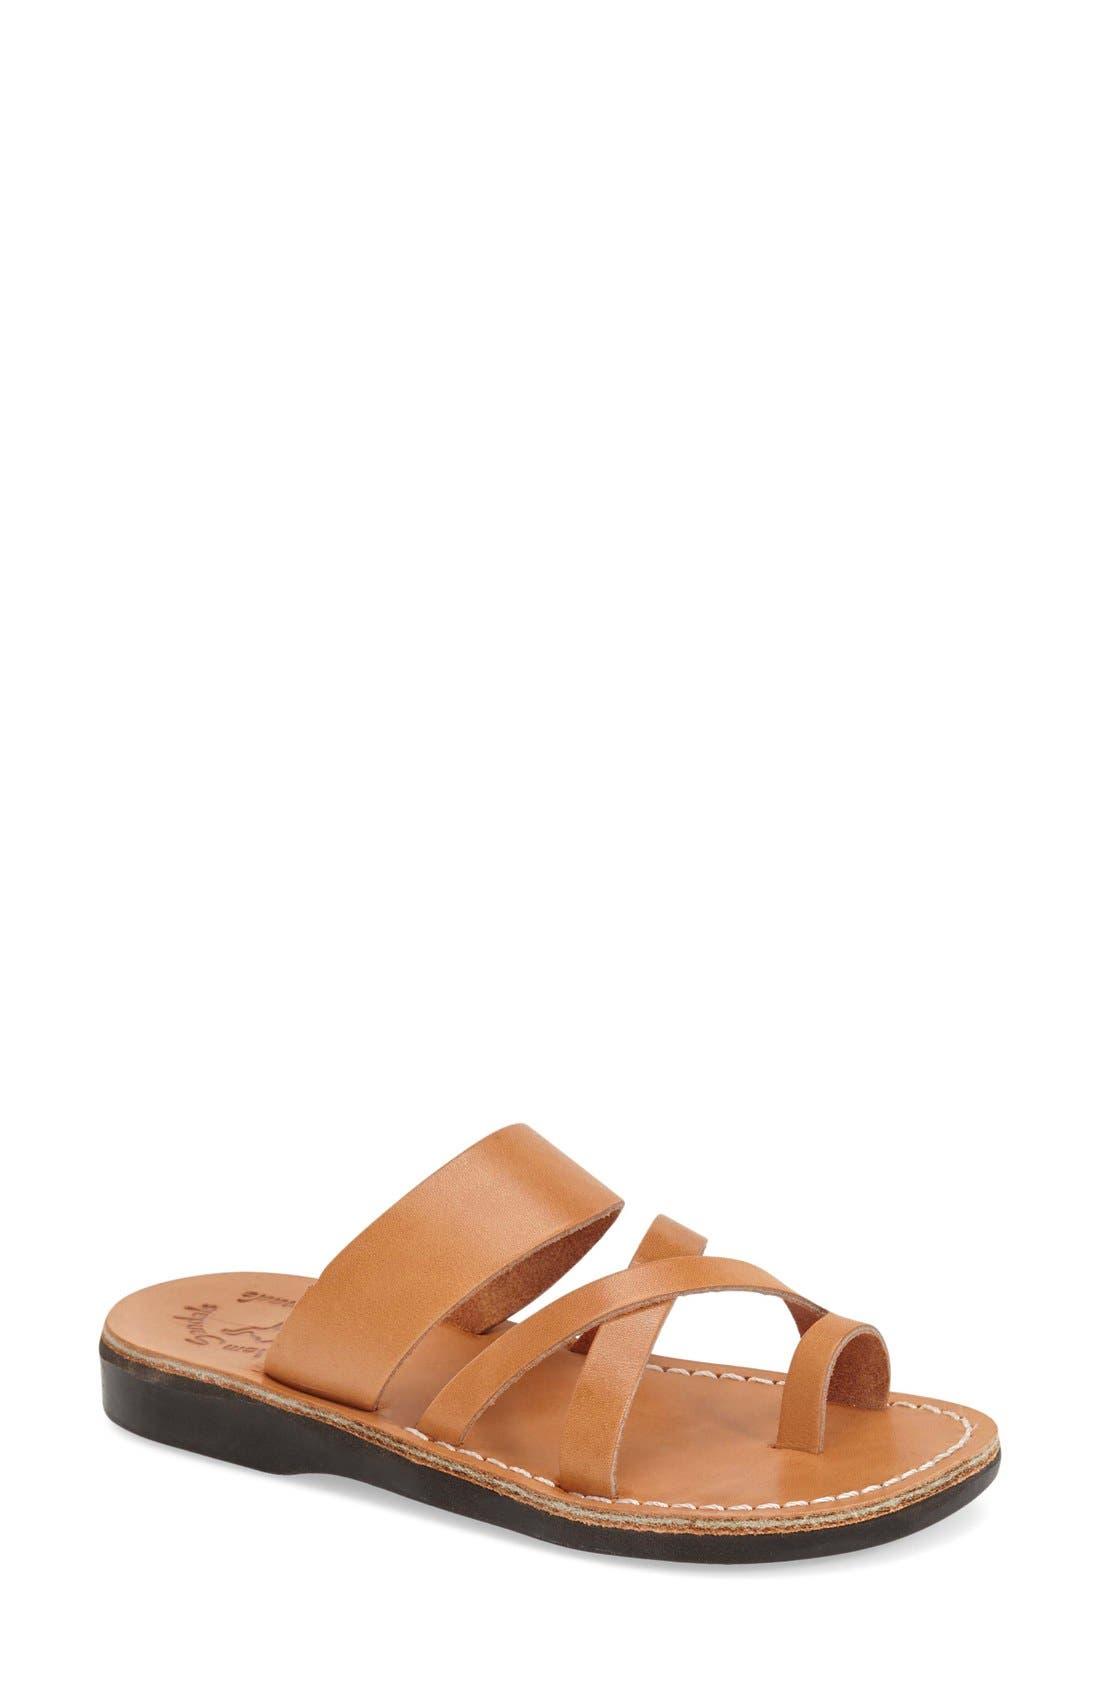 Main Image - Jerusalem Sandals 'The Good Shepard' Leather Sandal (Women)